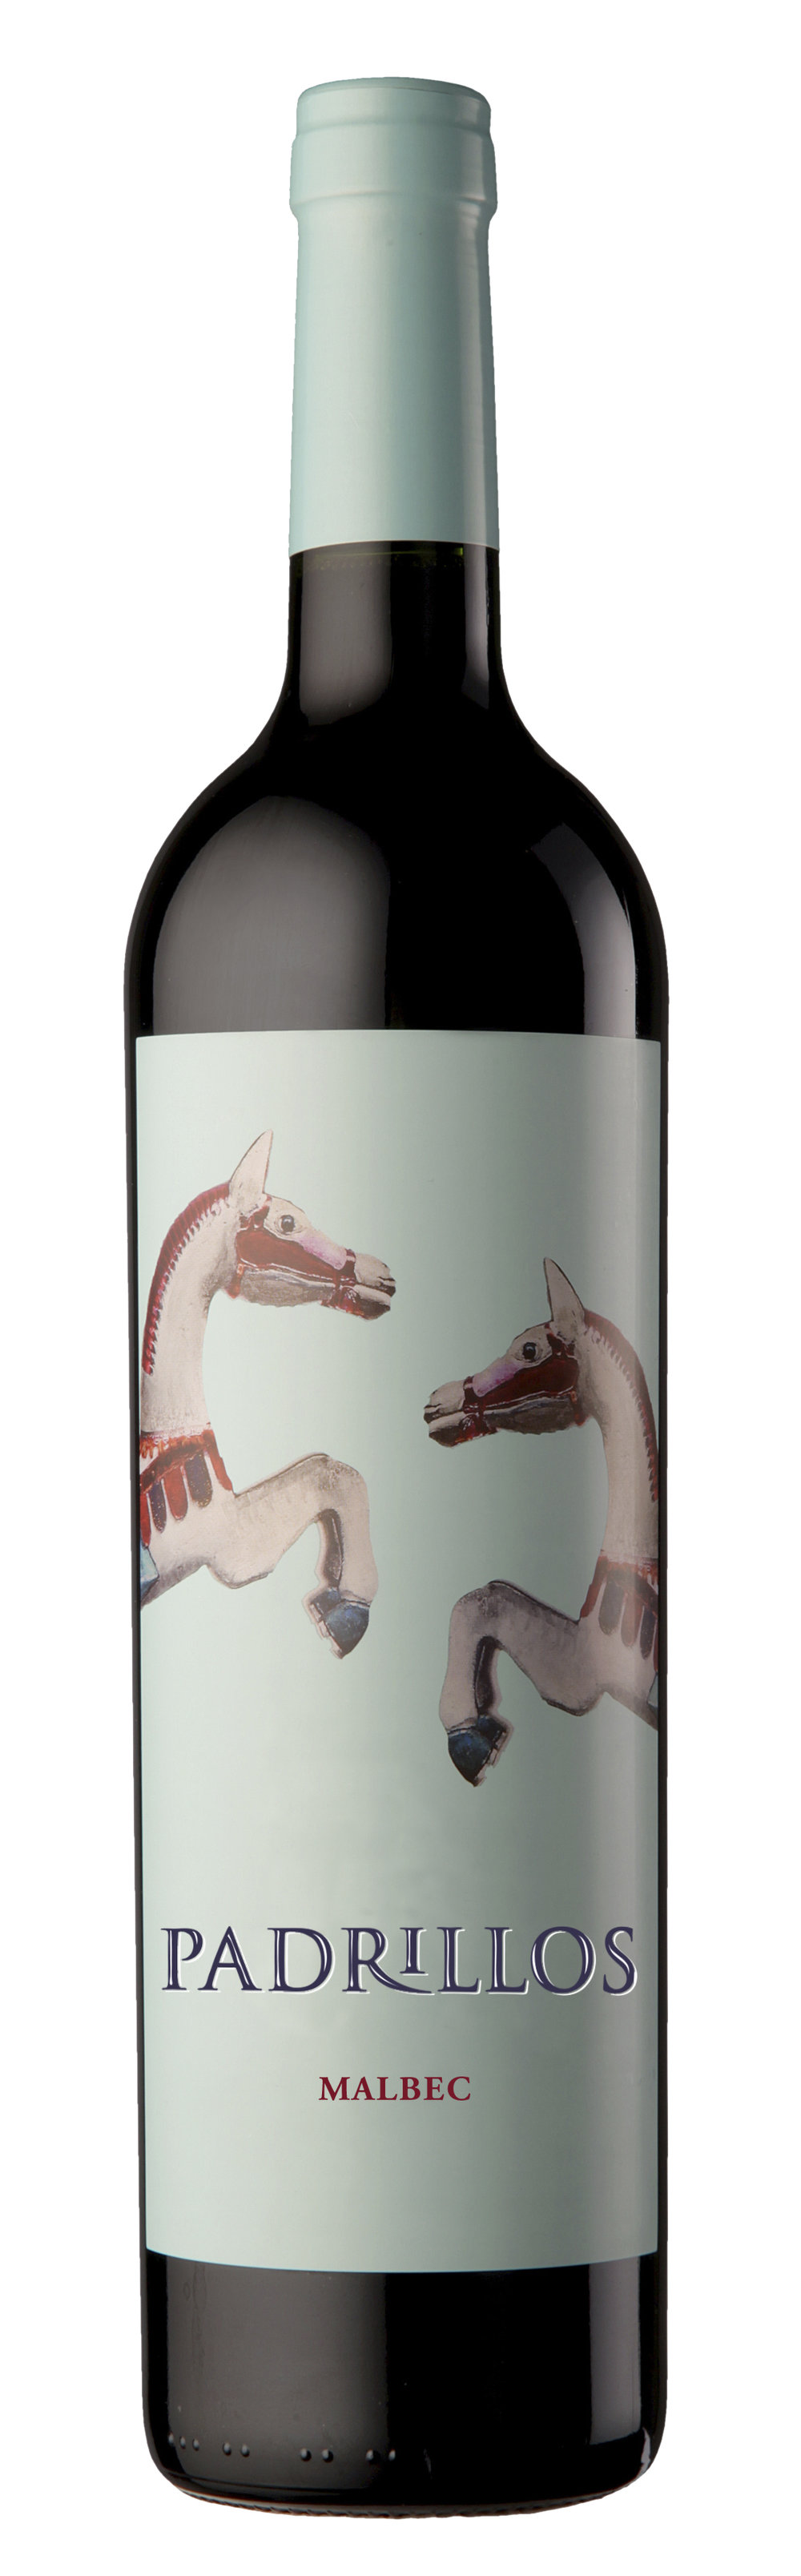 Padrillos Malbec Bottle.jpg